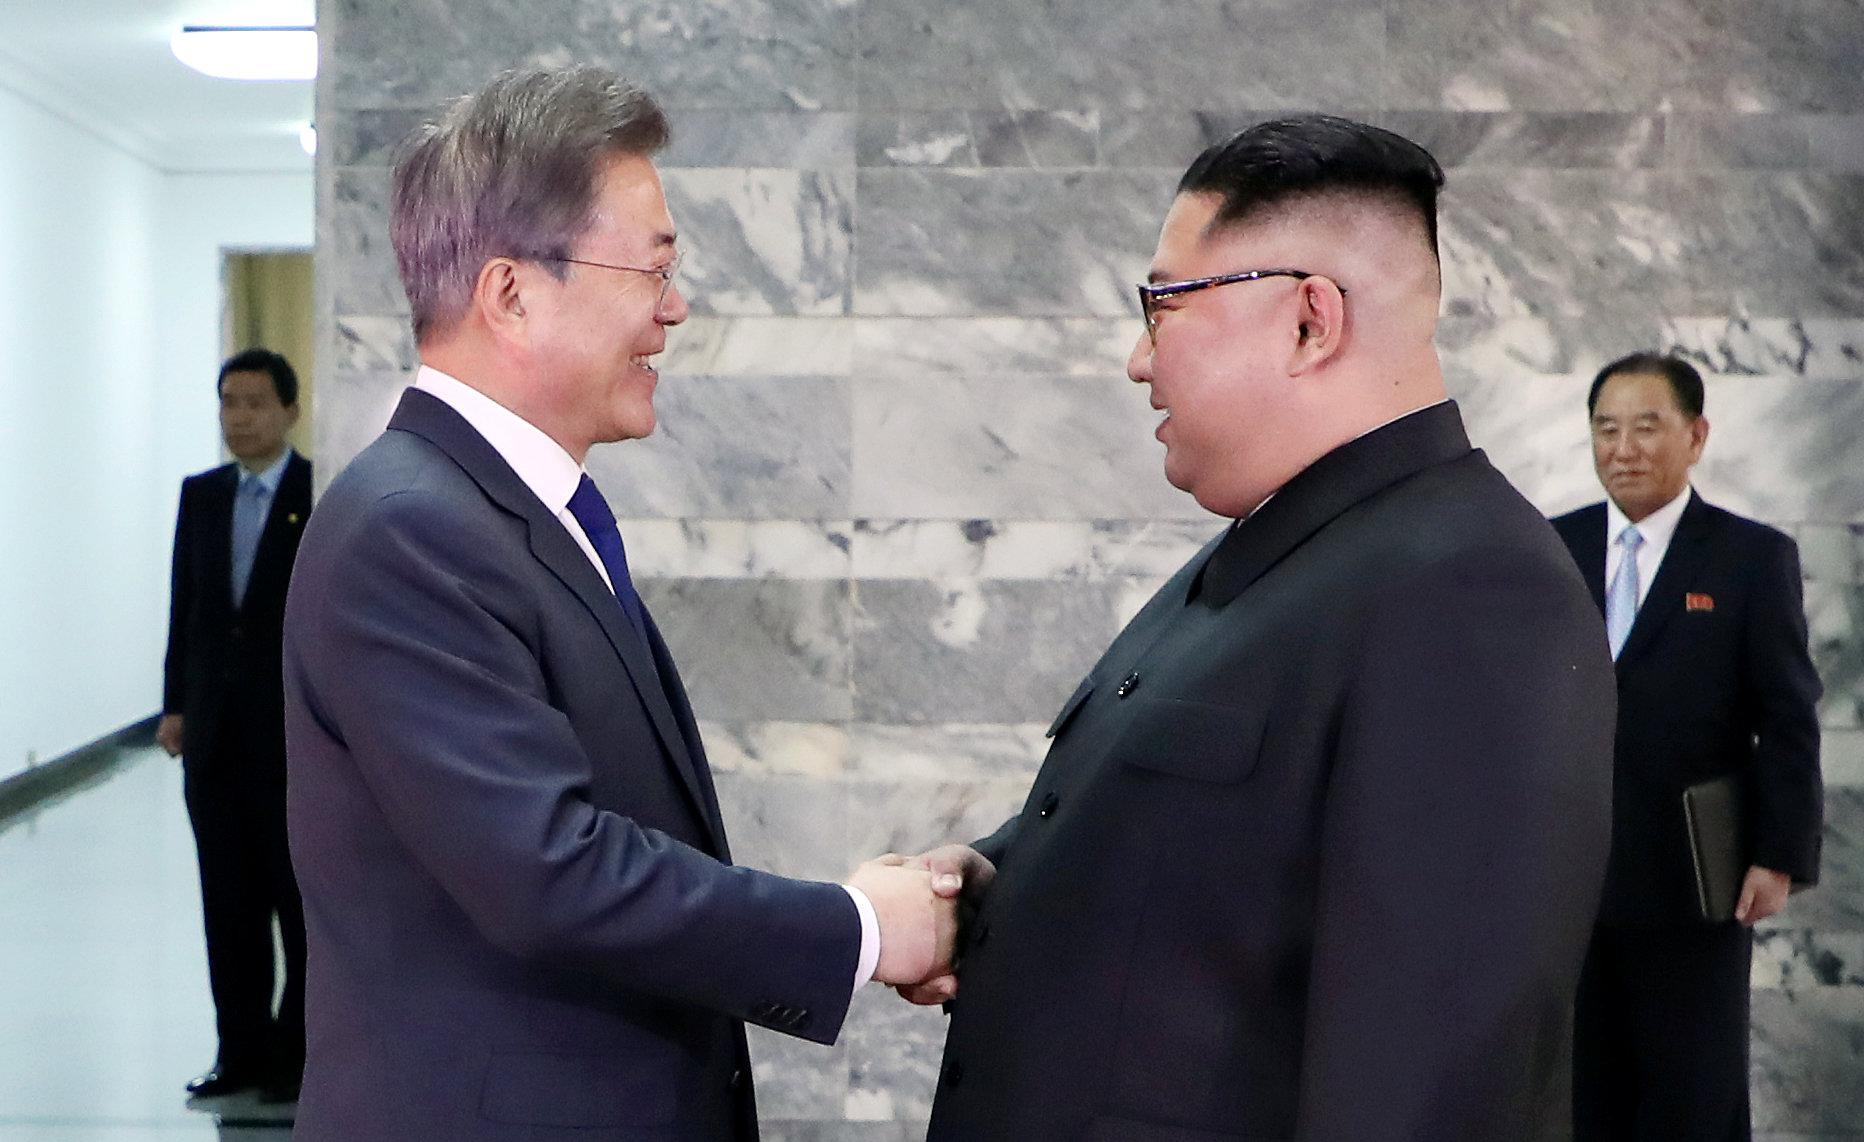 Ким Чен Ын и Мун Чже Ин провели новую встречу